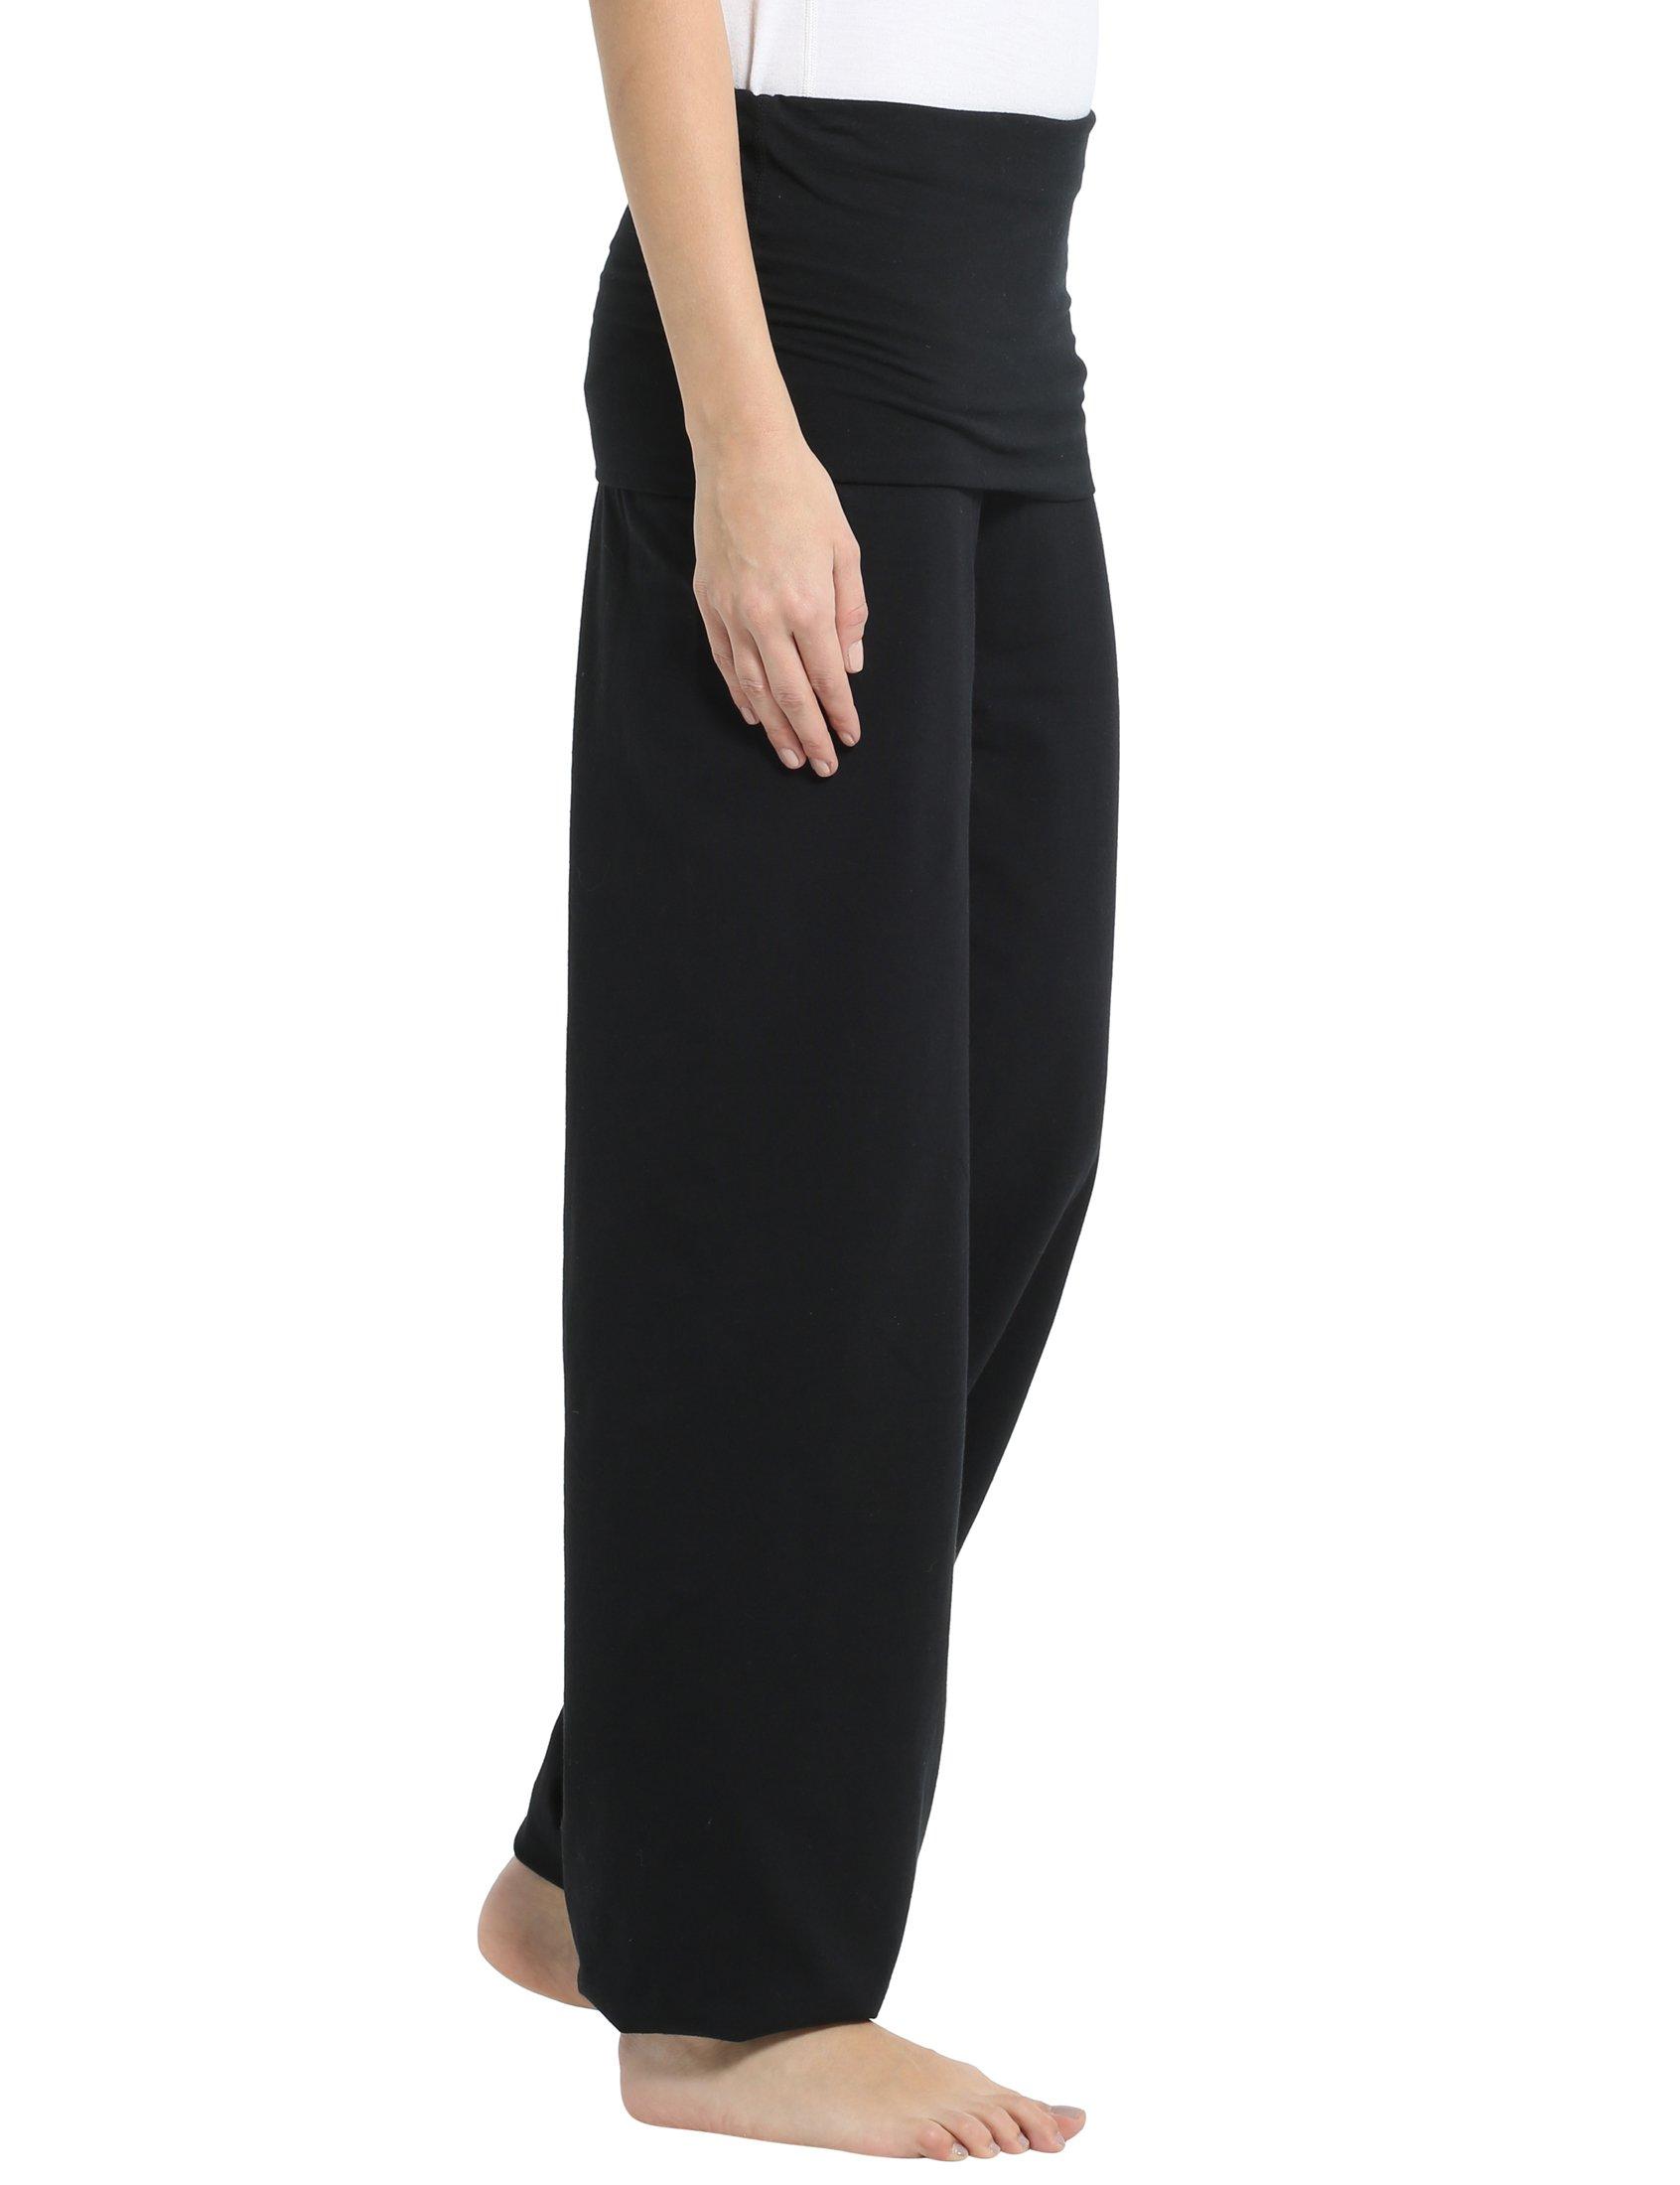 d9683bb1c7a91 Ultrasport Women's Yoga Pants Balance – Fold Over Womens Active ...